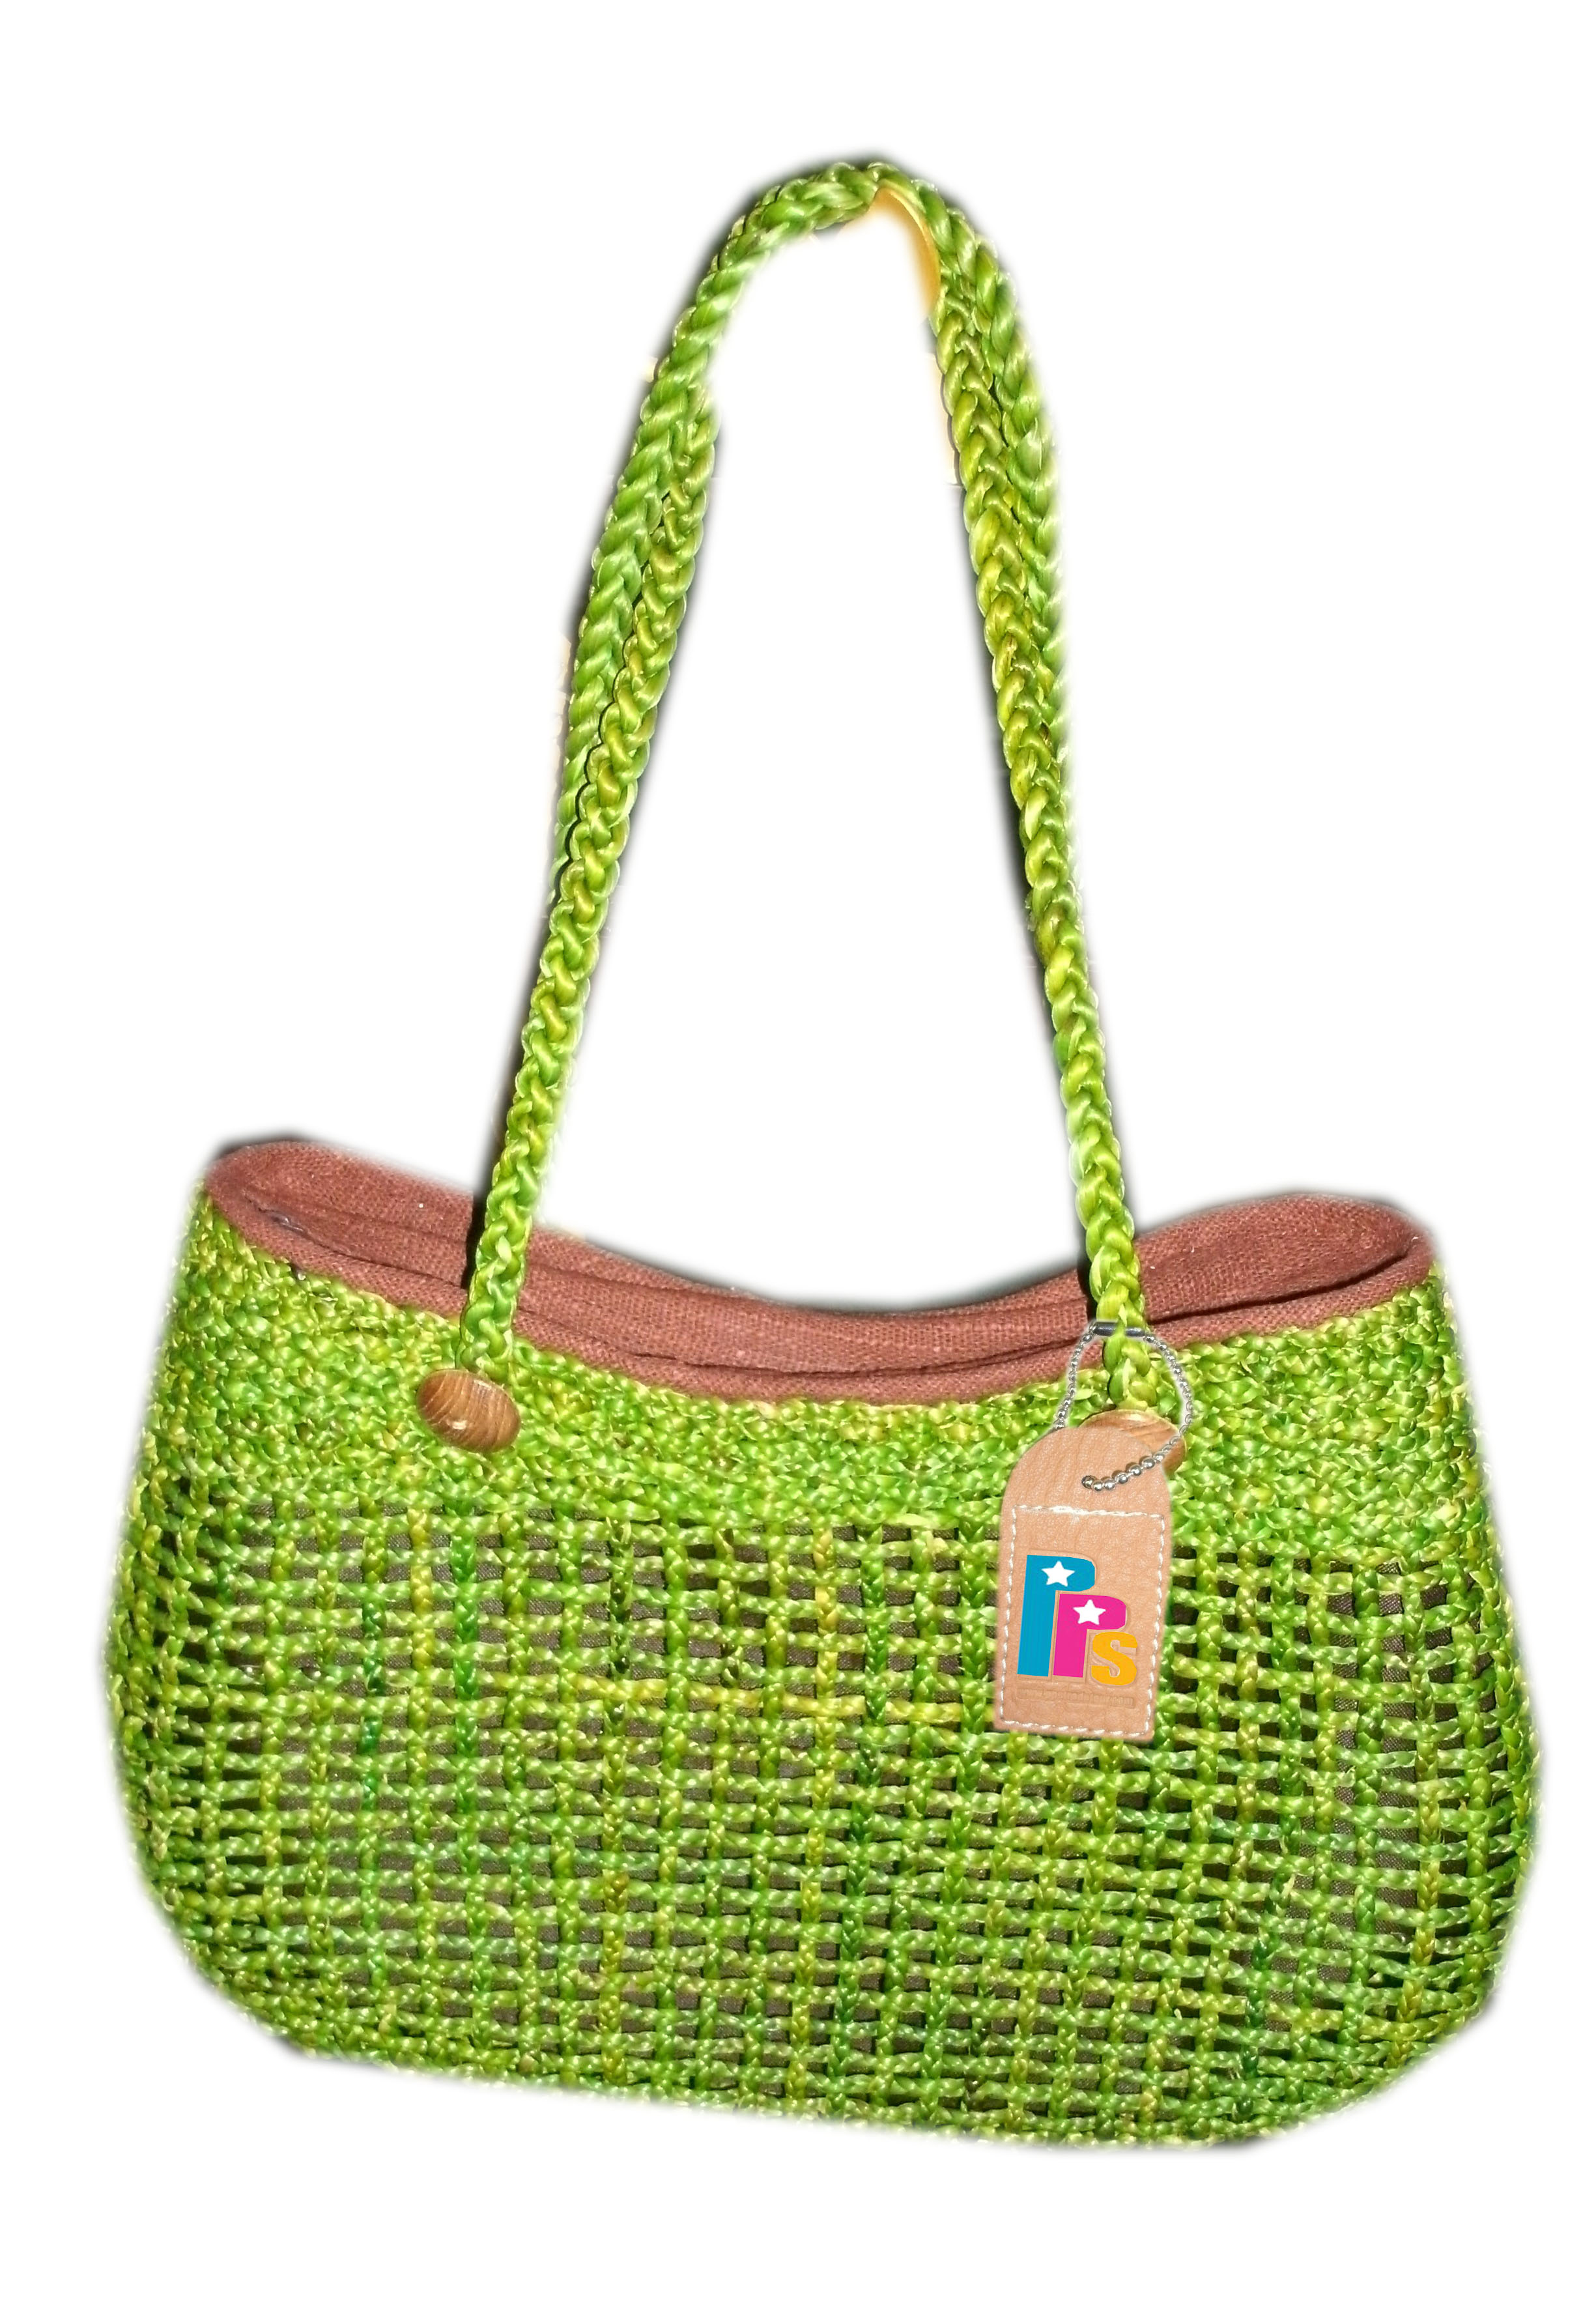 PPS-HyacinthBag1981